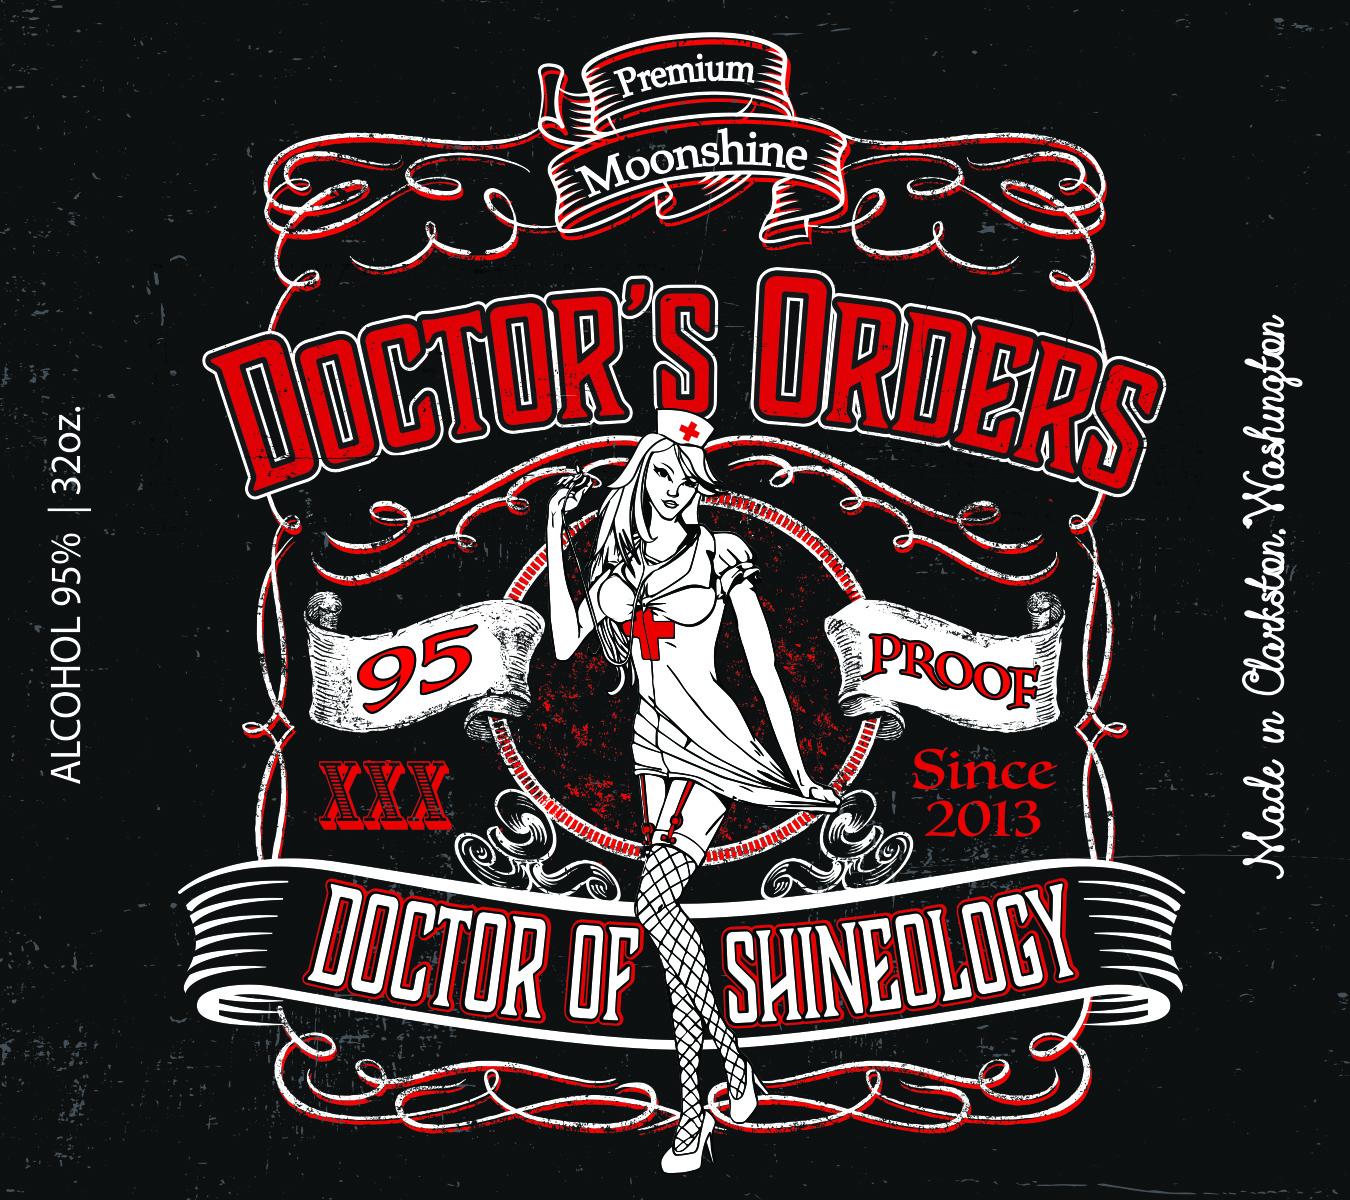 DoctorsOrder-Label.jpg